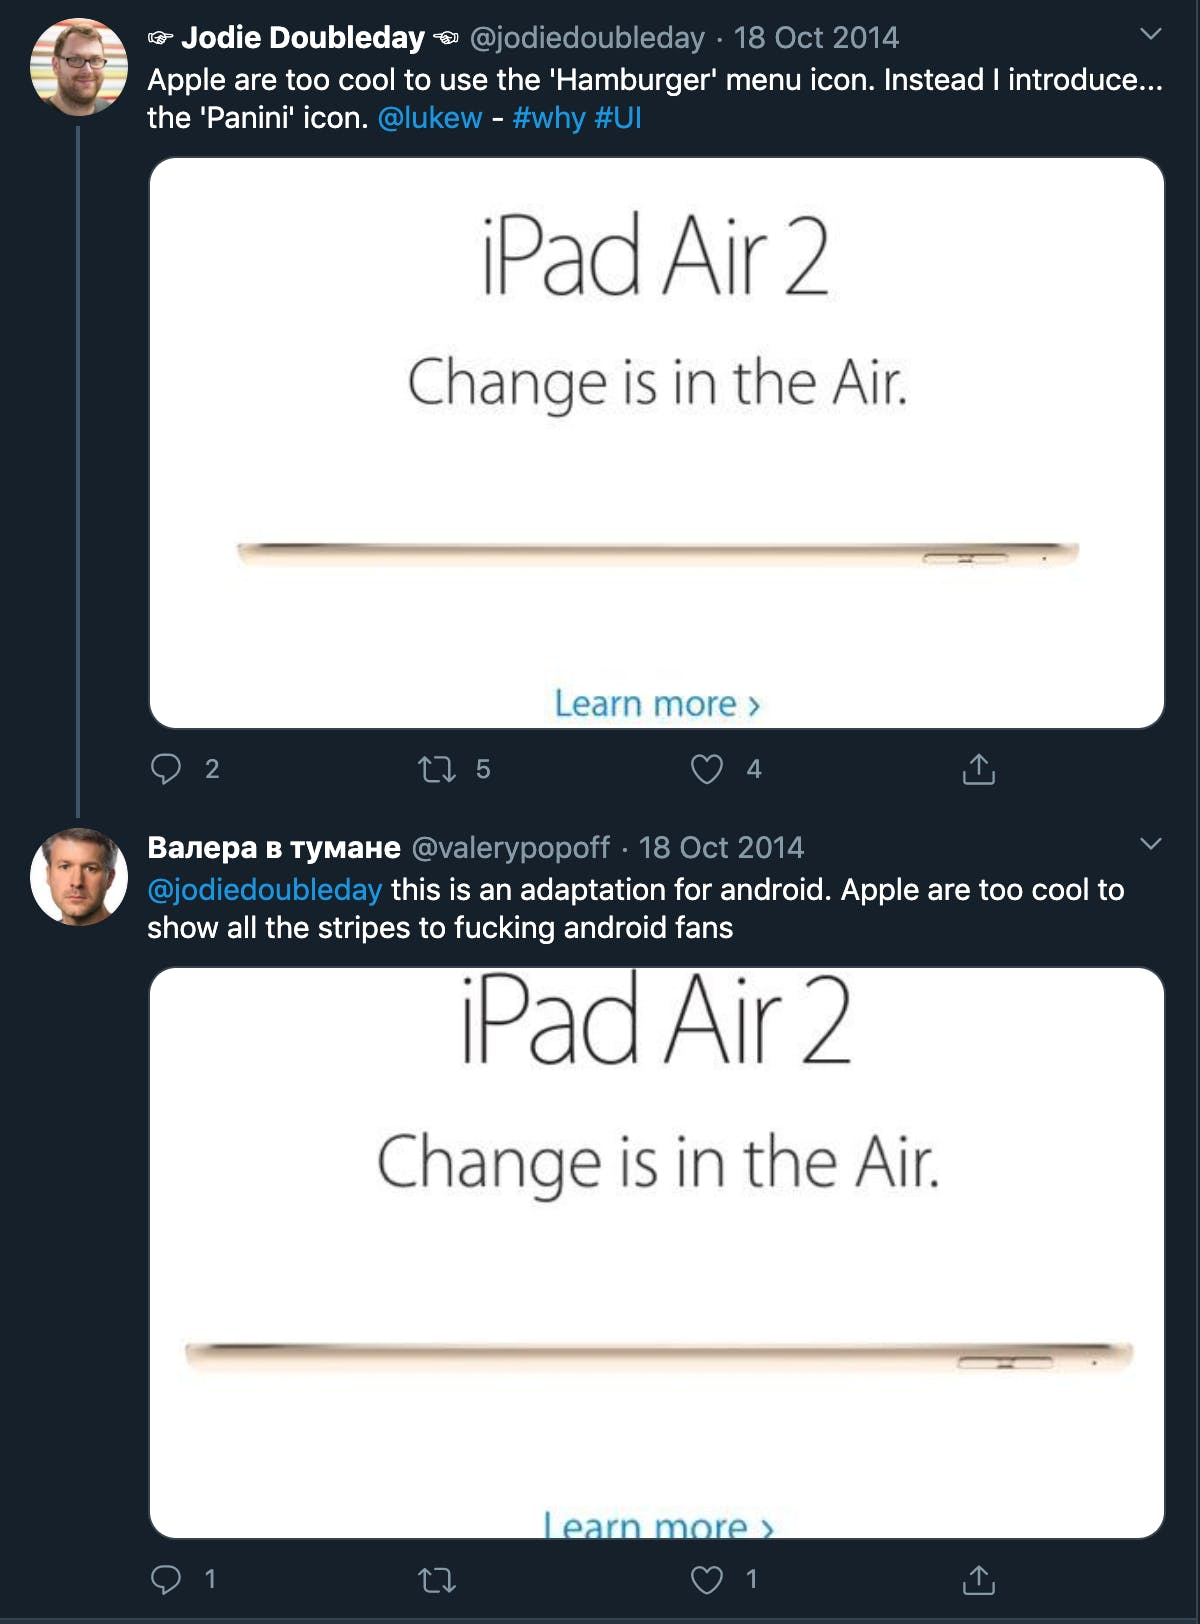 Screenshot of twitter feed showing Apple hamburger menu